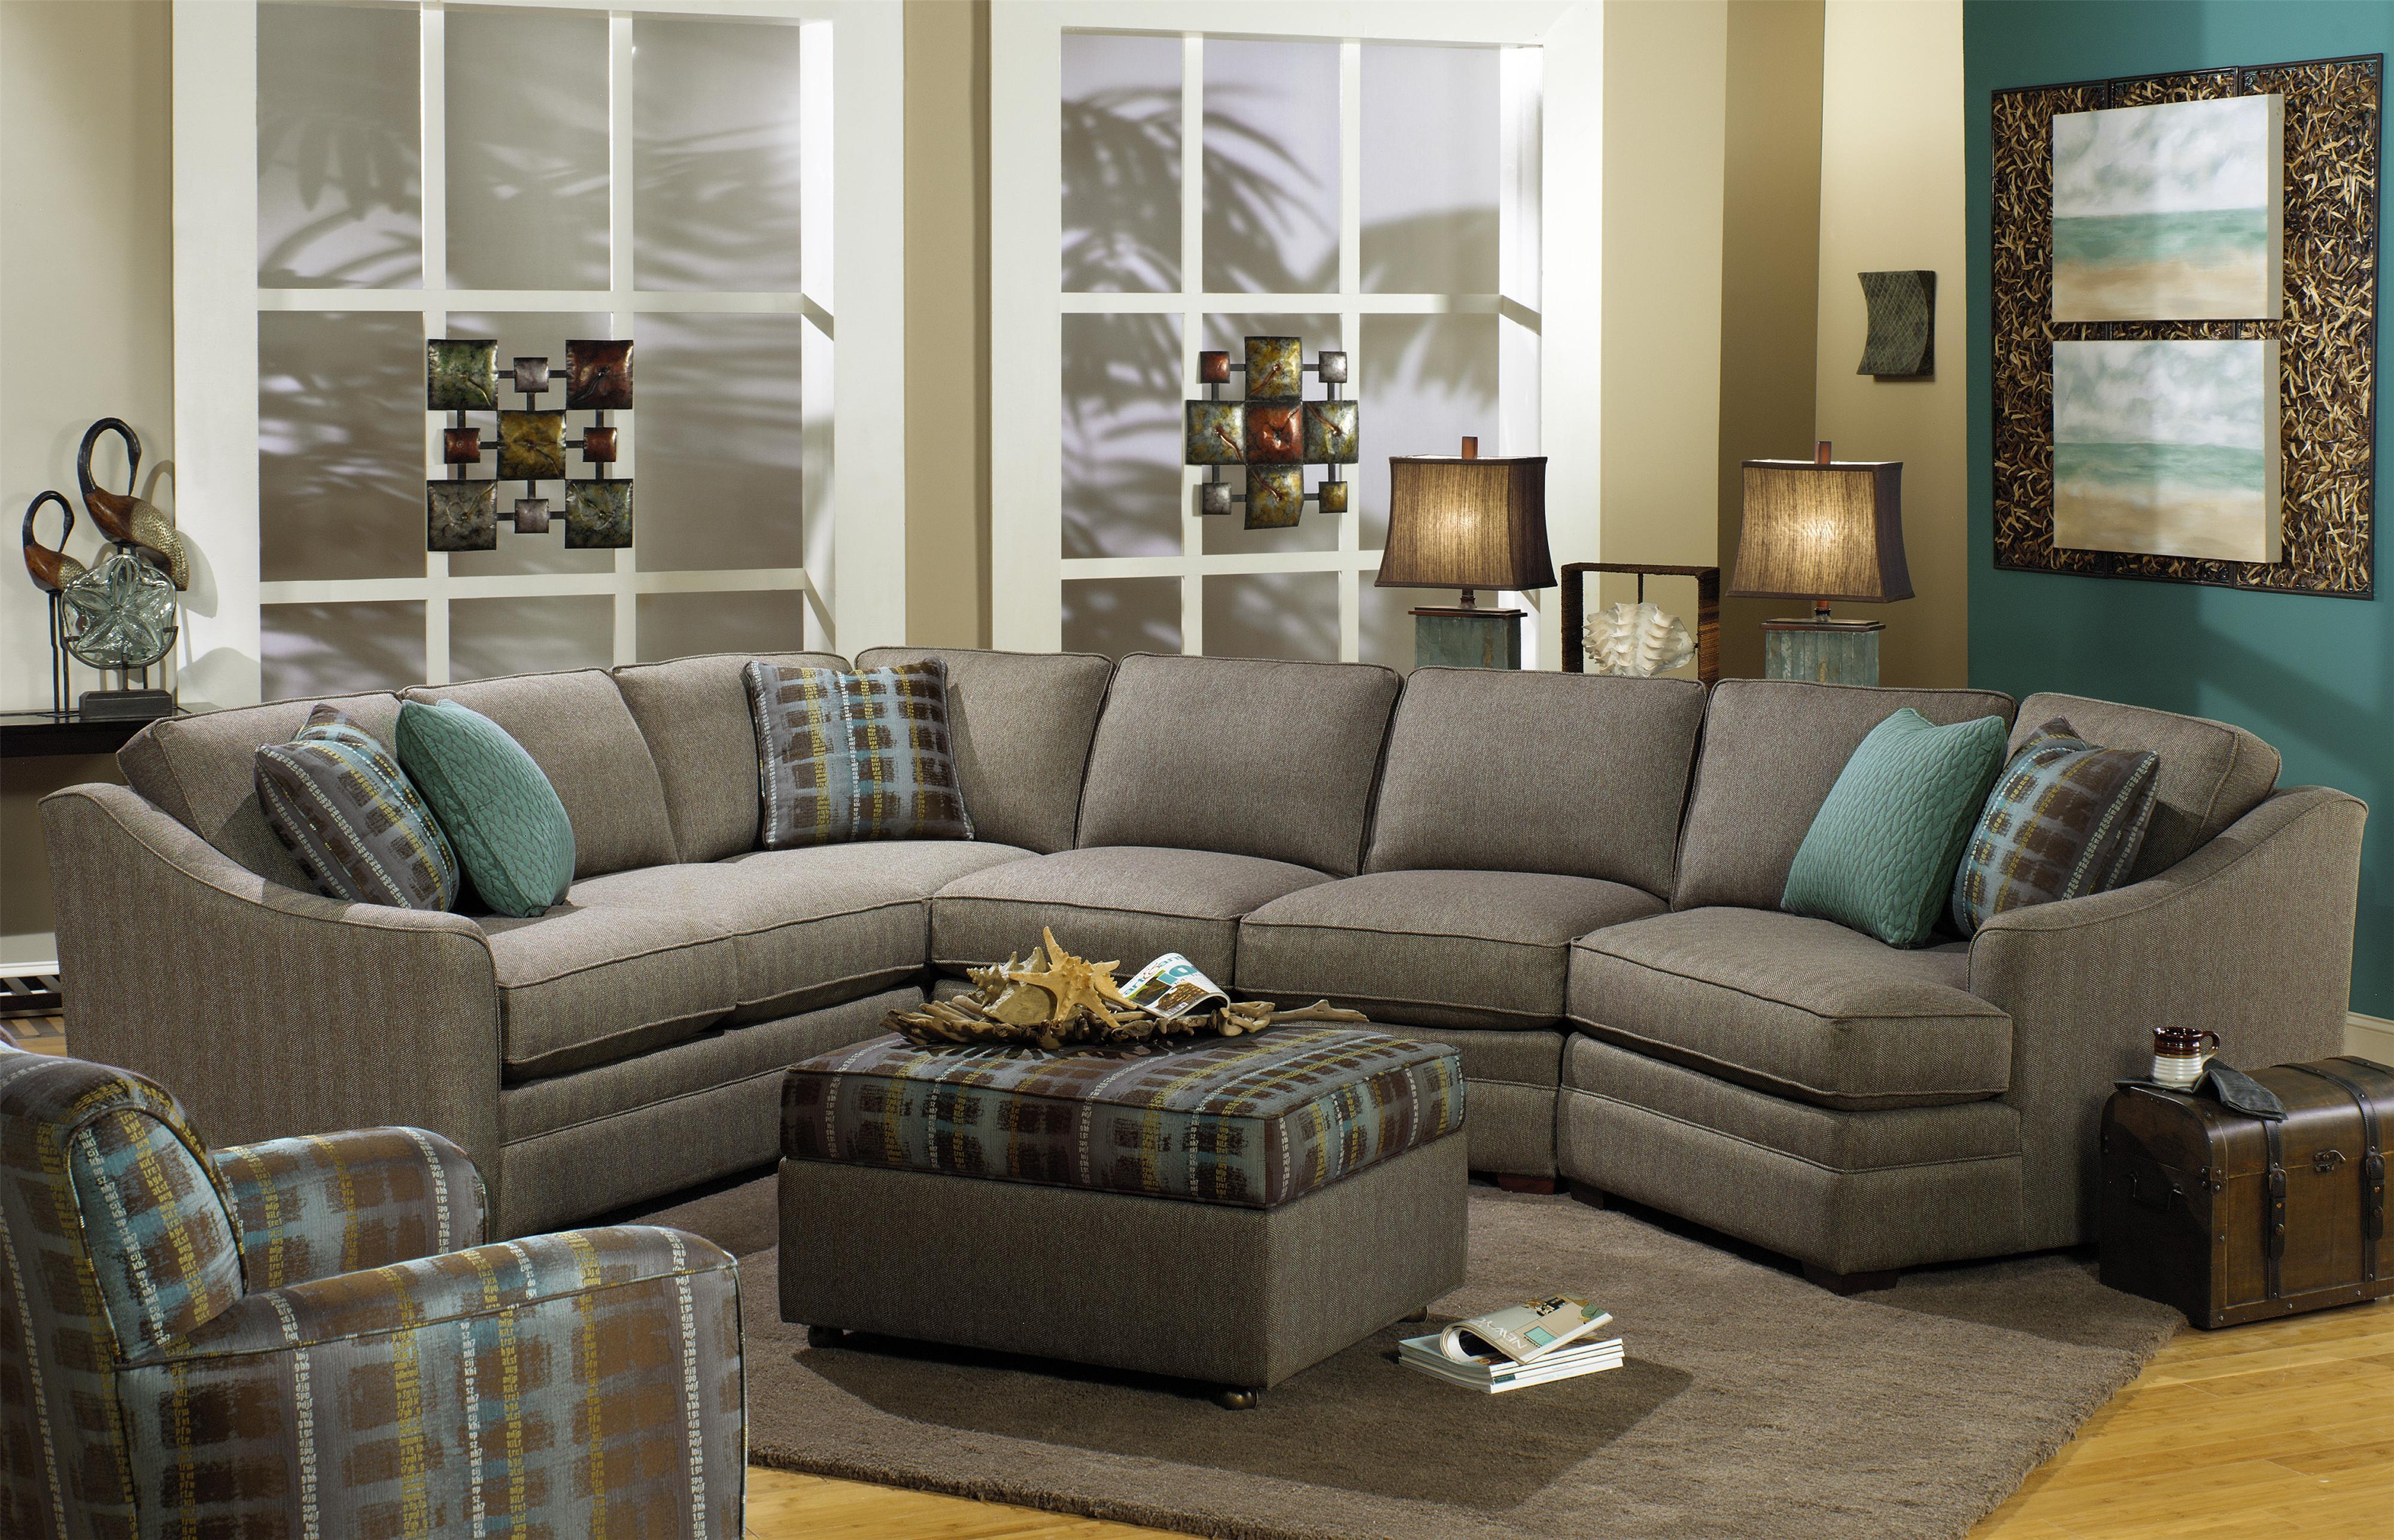 broyhill sofa nebraska furniture mart king hickory quality craftmaster f9 custom collection customizable 3 piece